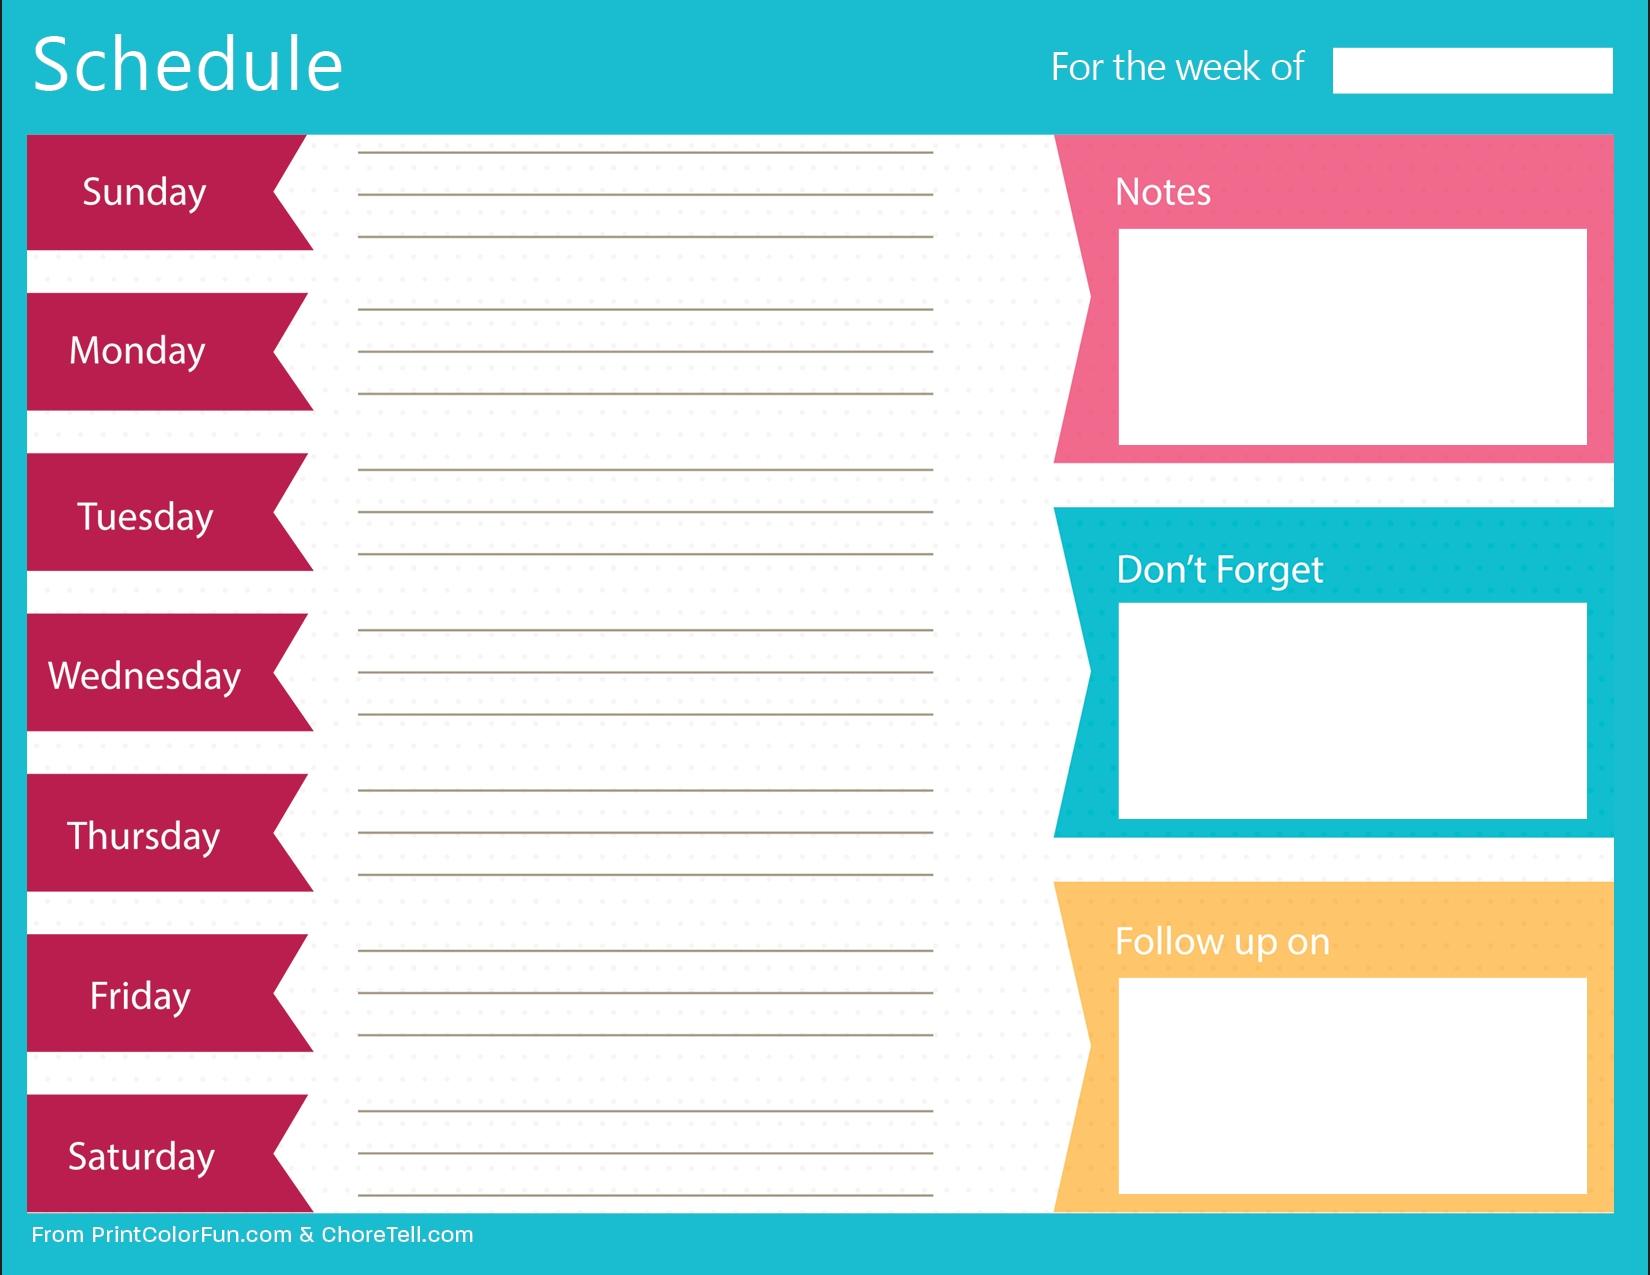 Schedule Template Free Planner Weekly Timetable Desktop | Smorad with regard to Free Printable Weekly Schedule Planner